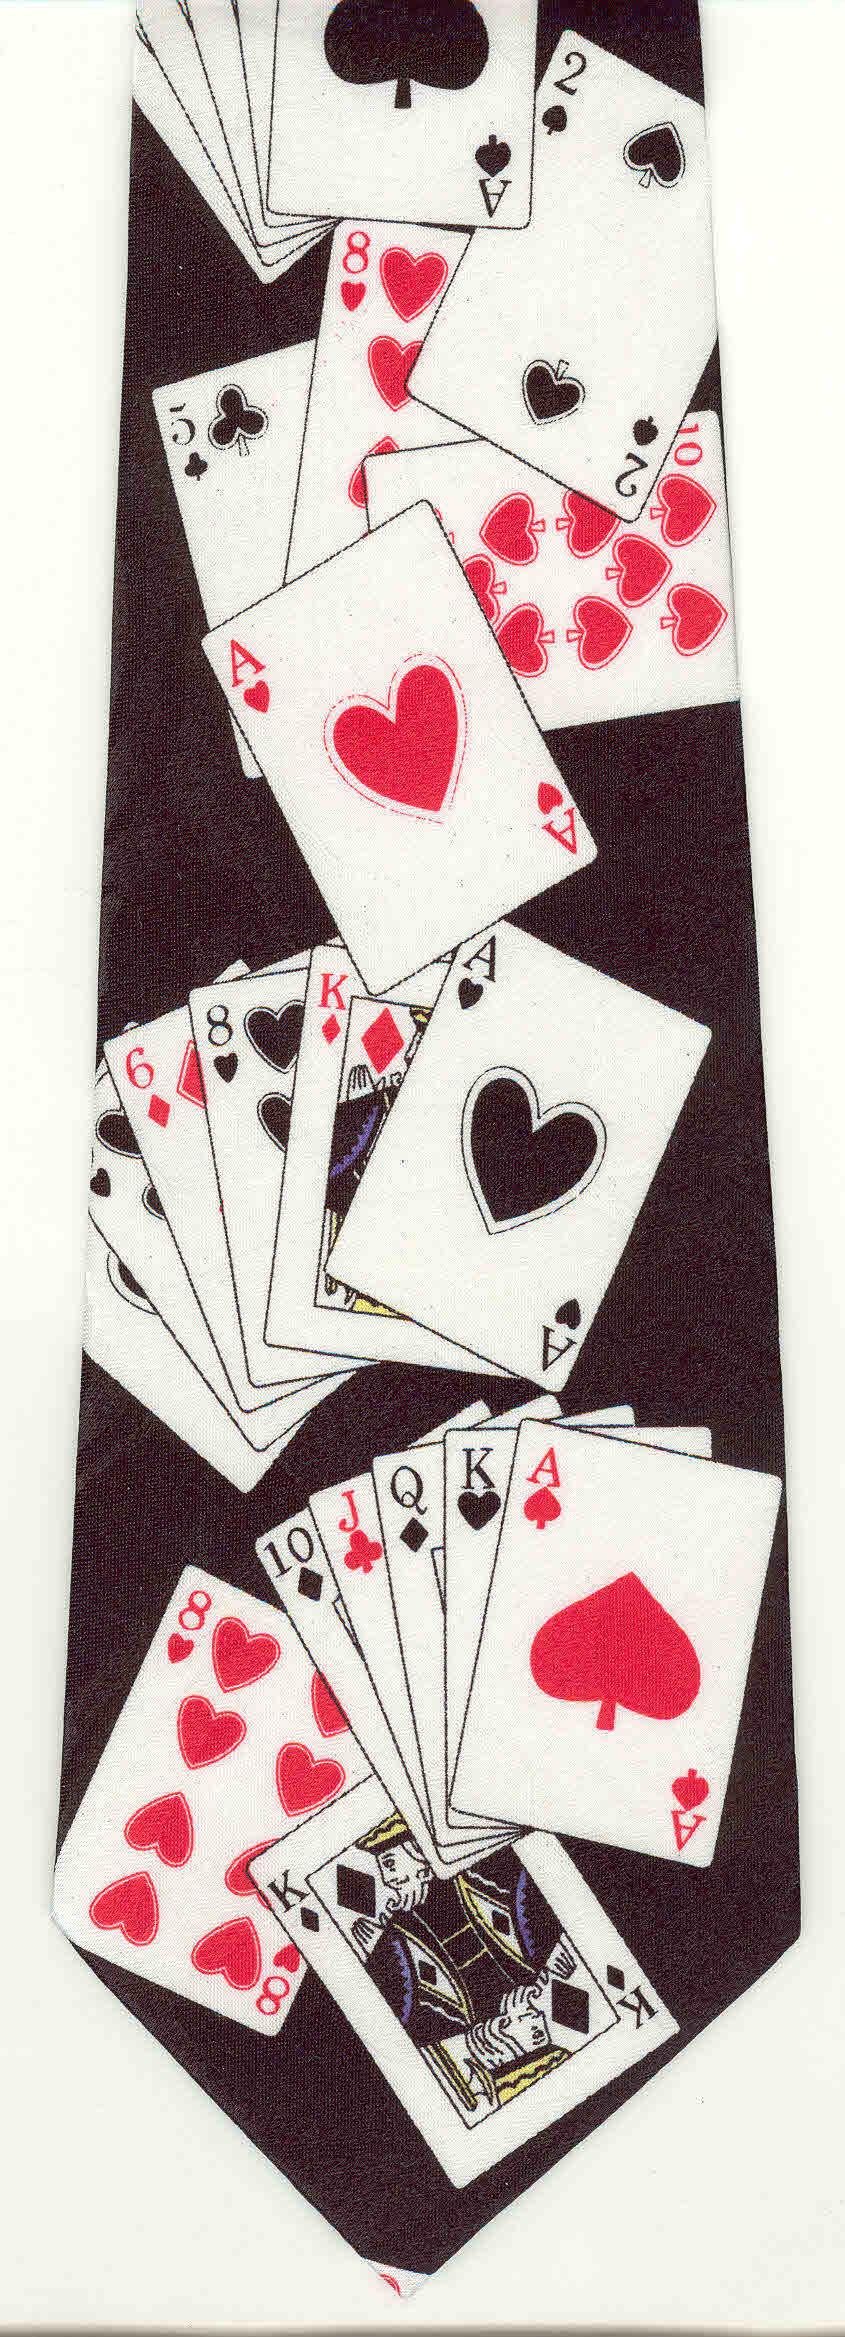 055 Card Fans.jpg